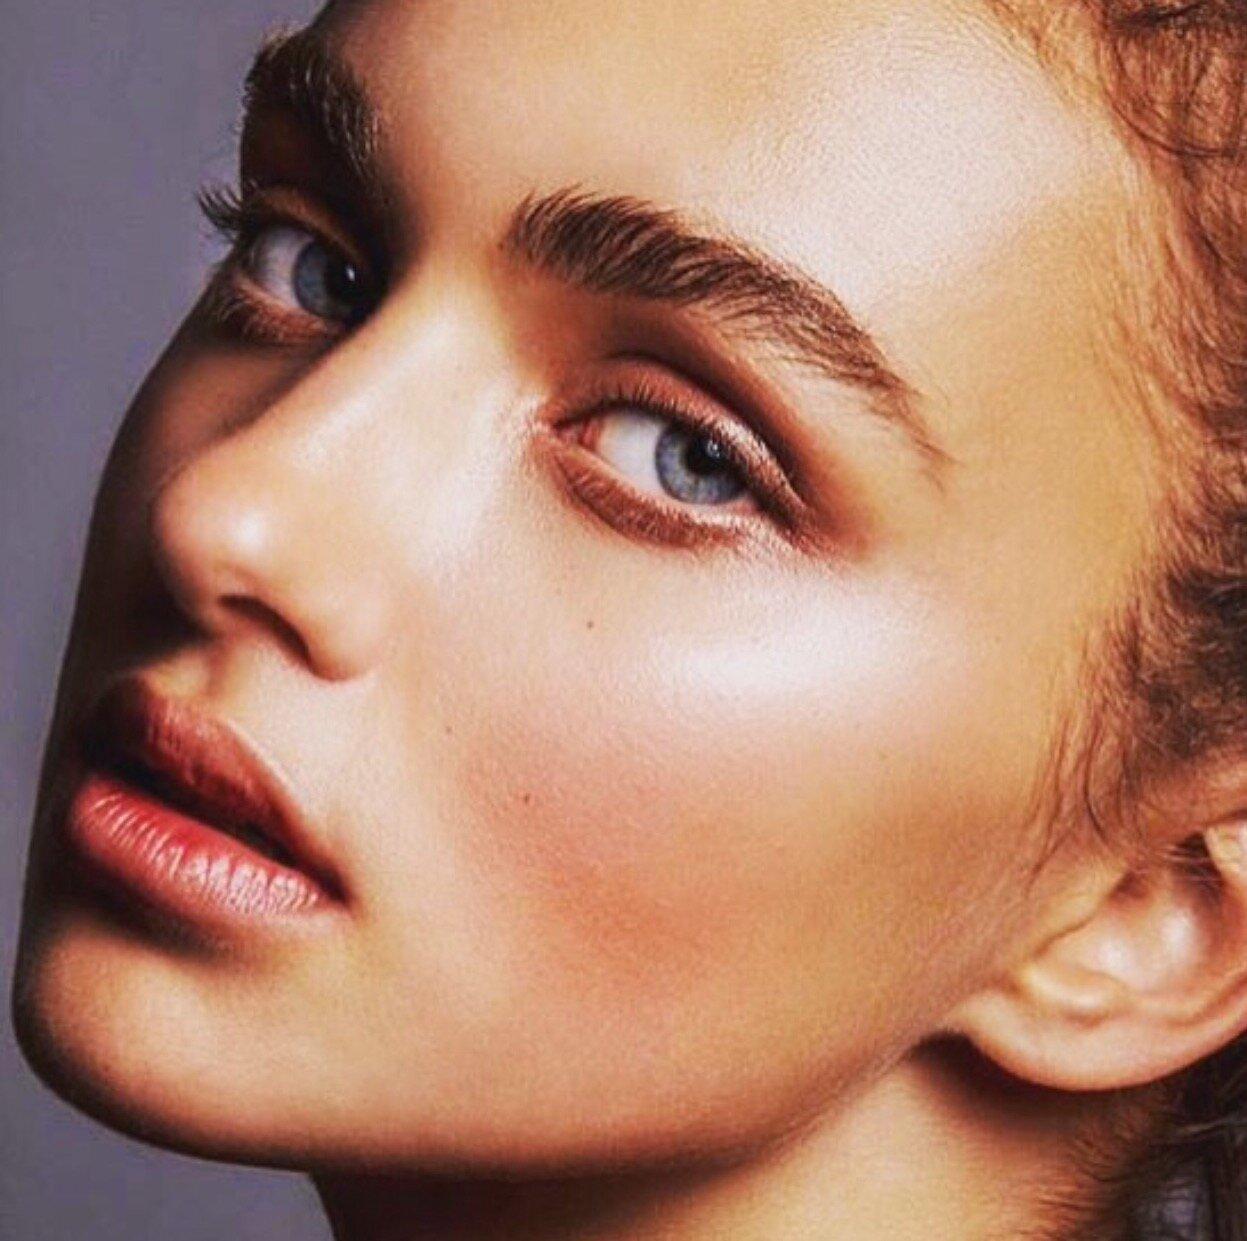 Beauty Routine Post Vacanze & i Prodotti & Consigli Utili...by MÁDARA & The Beauty Boutique